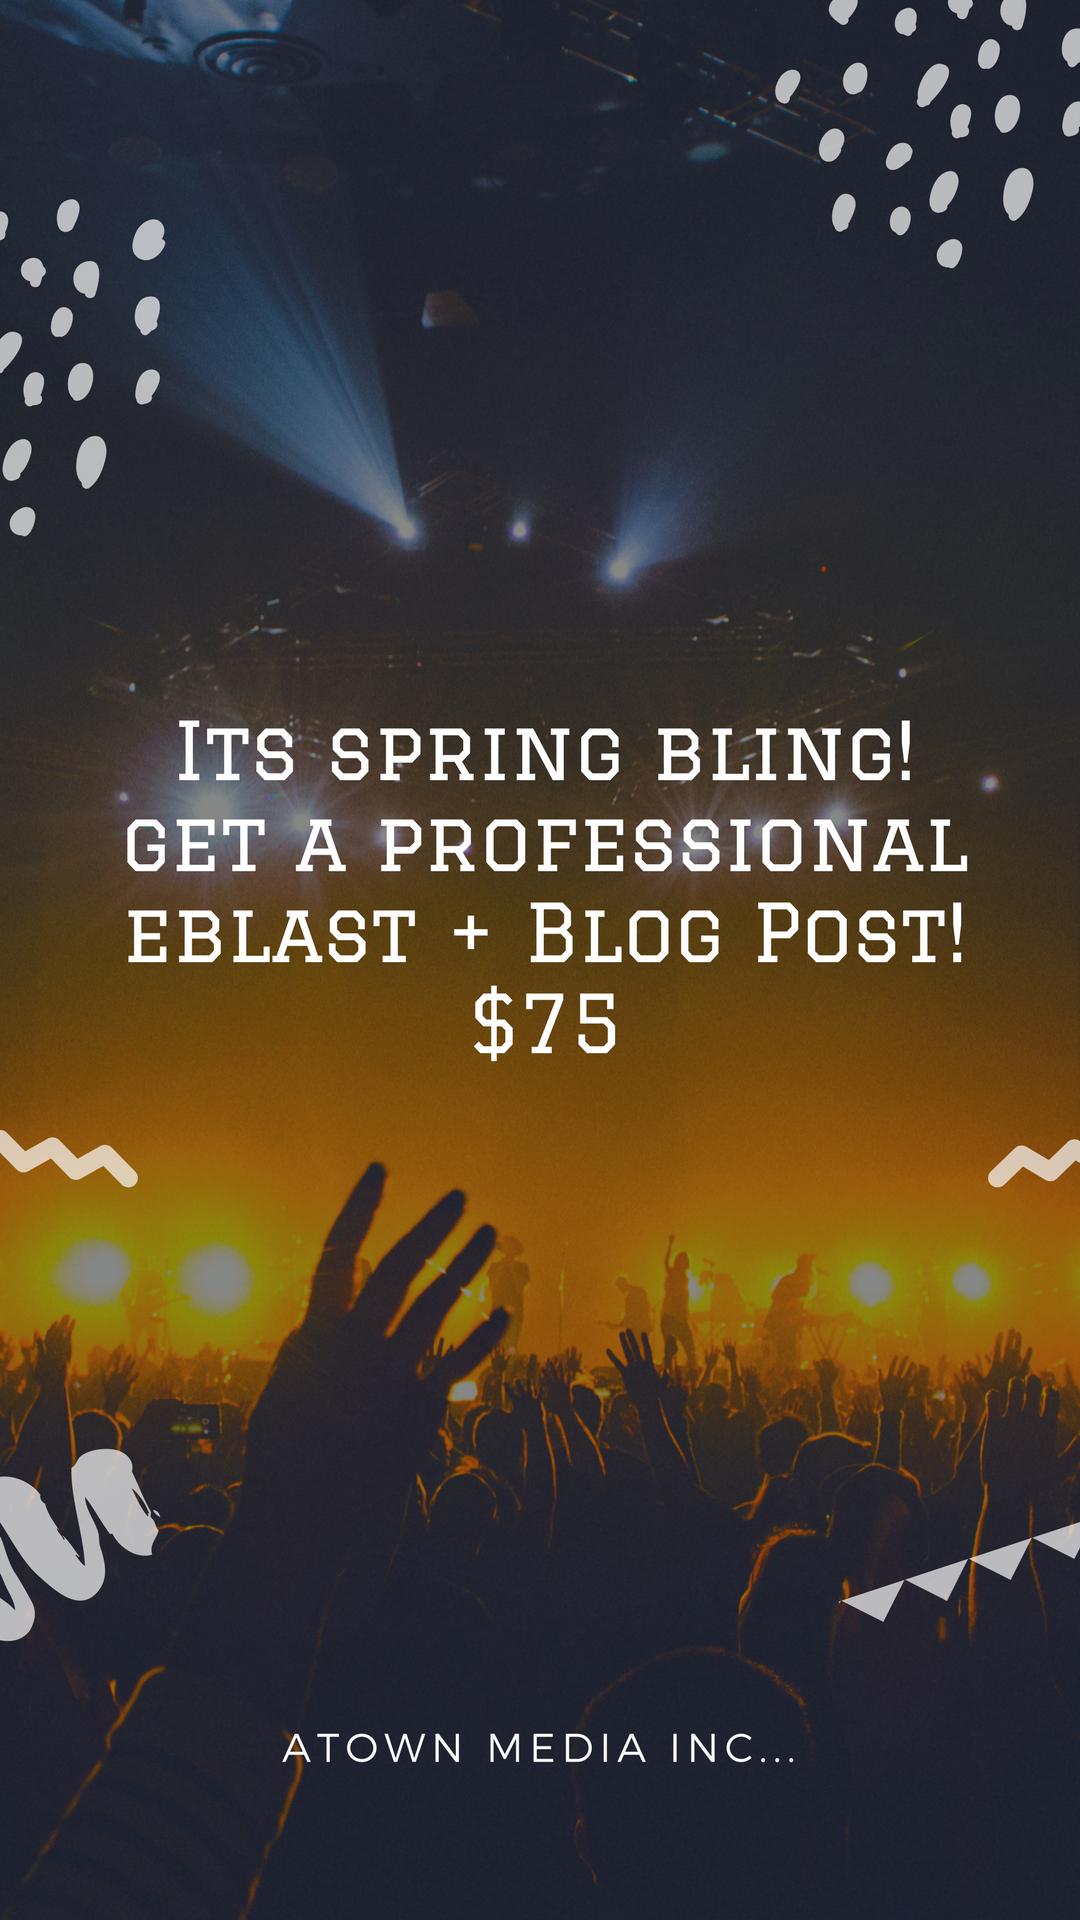 50% OFF Your Favorite Promo! Eblast | Blogs| Dj Service Pack